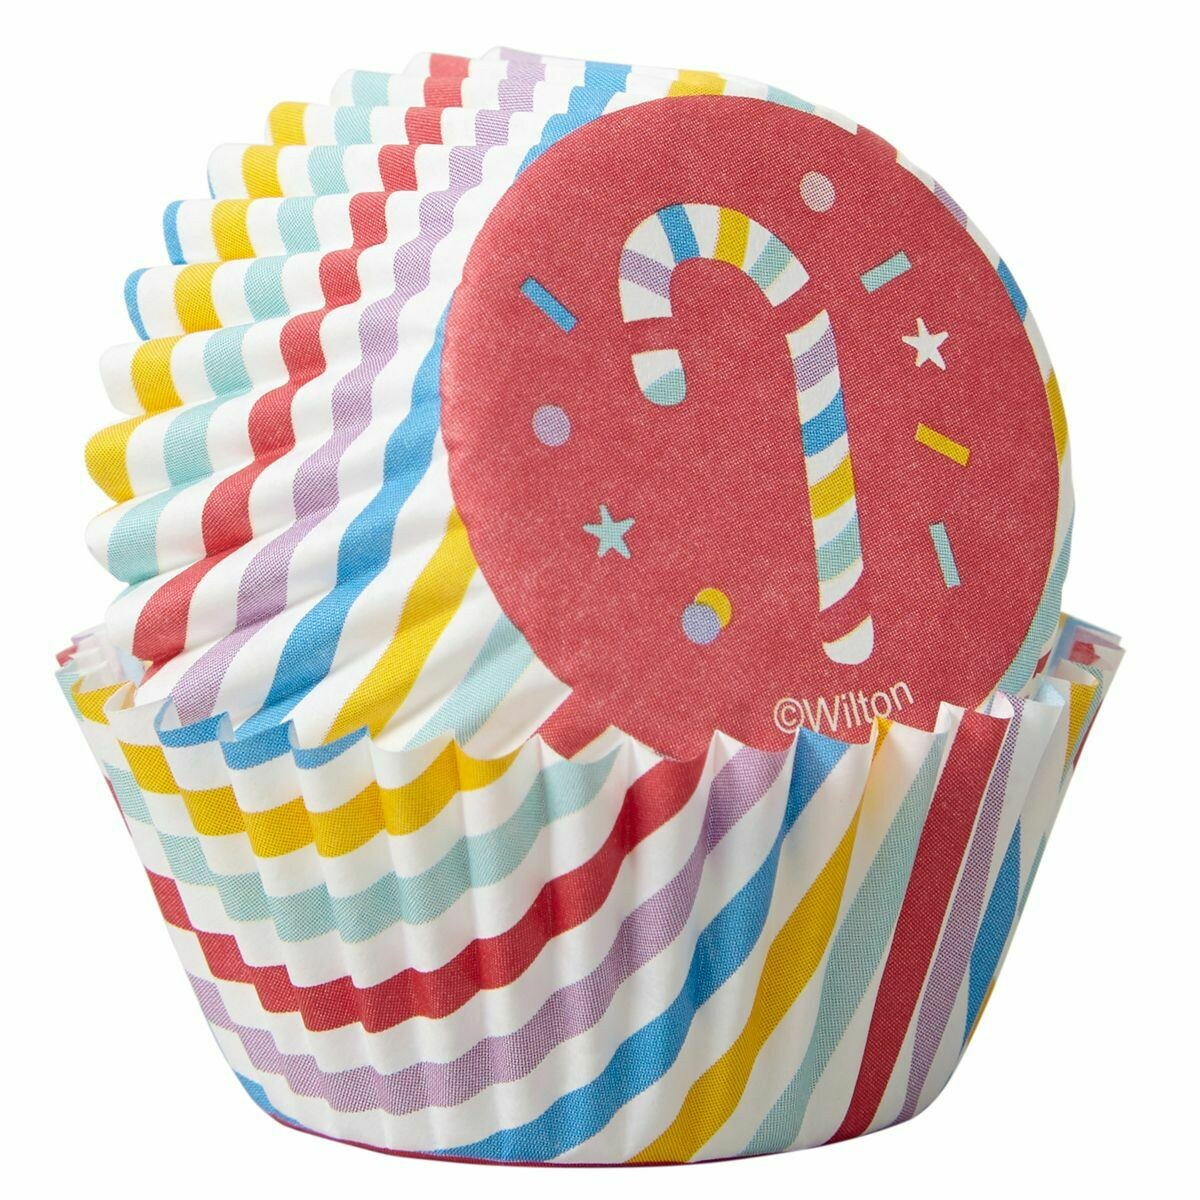 SALE!!! Wilton Christmas Cupcake Cases -MINI -CANDY CANES -Μίνι Θήκες ψησίματος Καπκέικ/Μάφιν 100τμχ